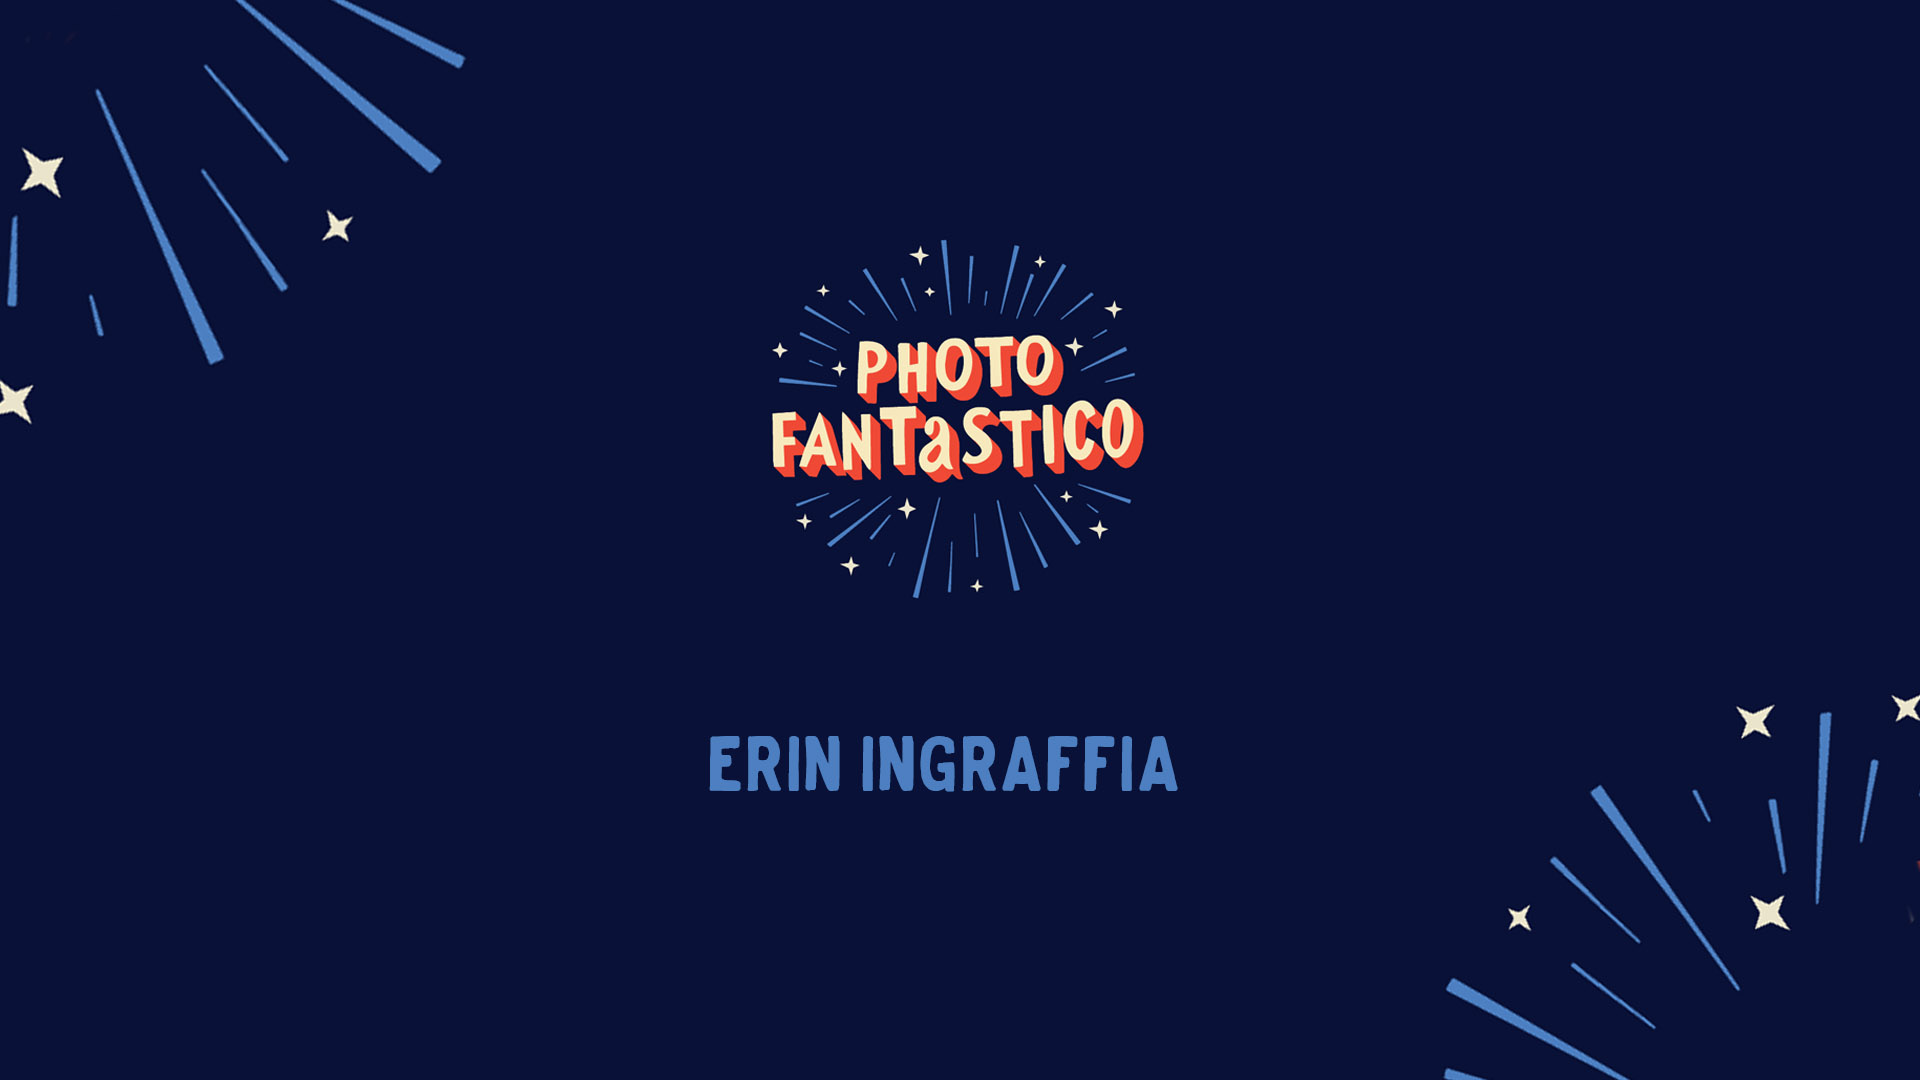 Erin Ingraffia